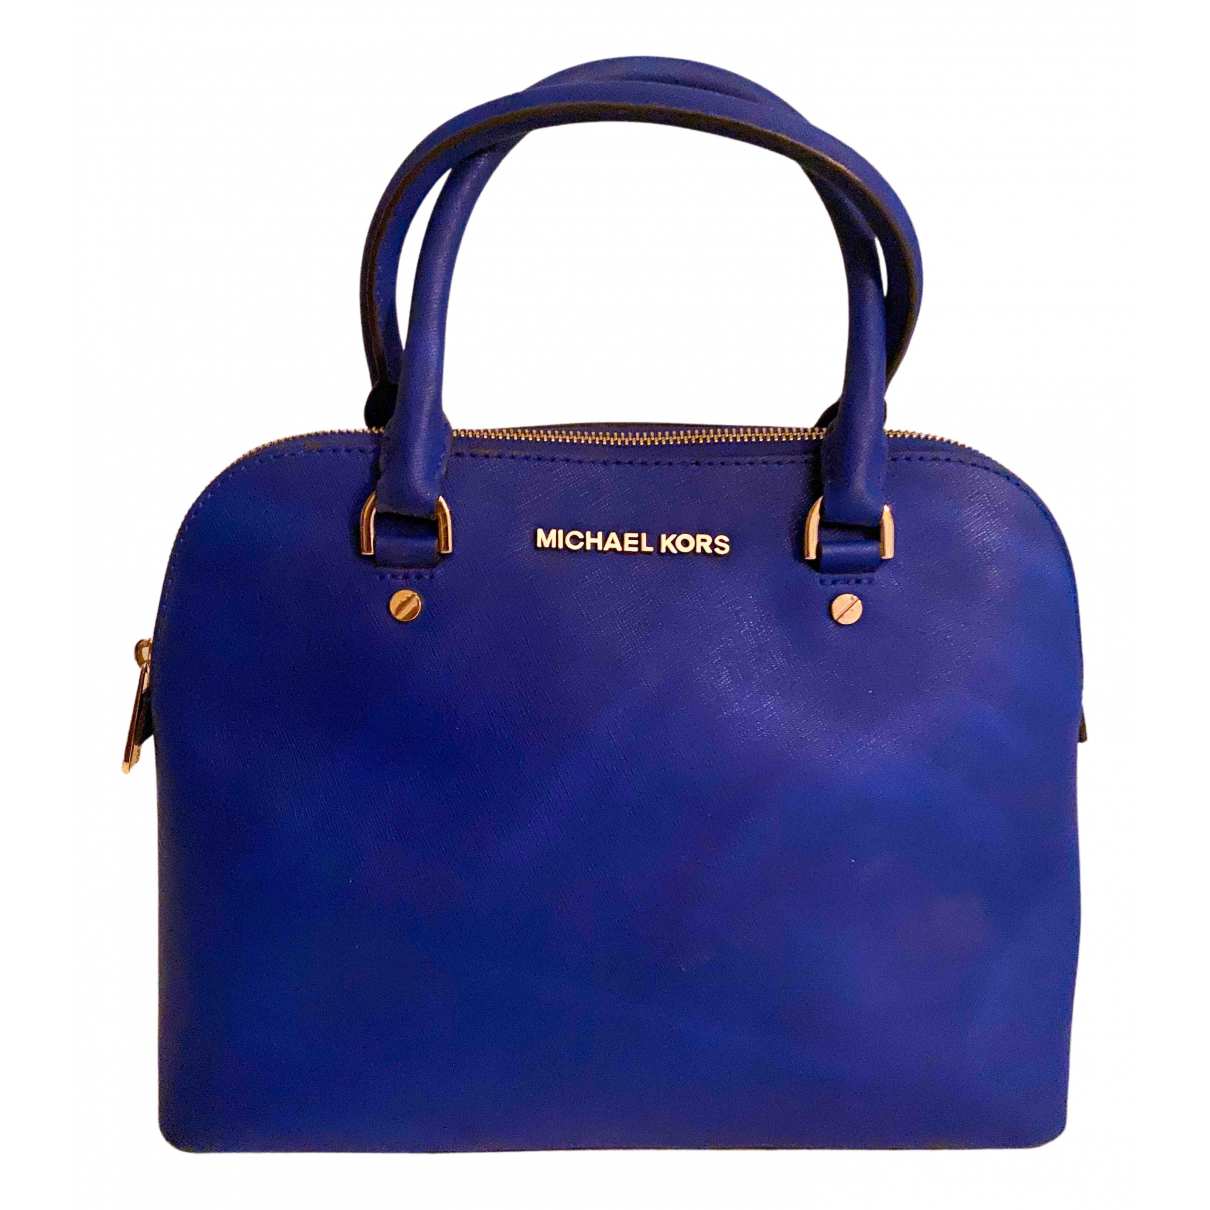 Michael Kors Cindy Blue Leather handbag for Women N